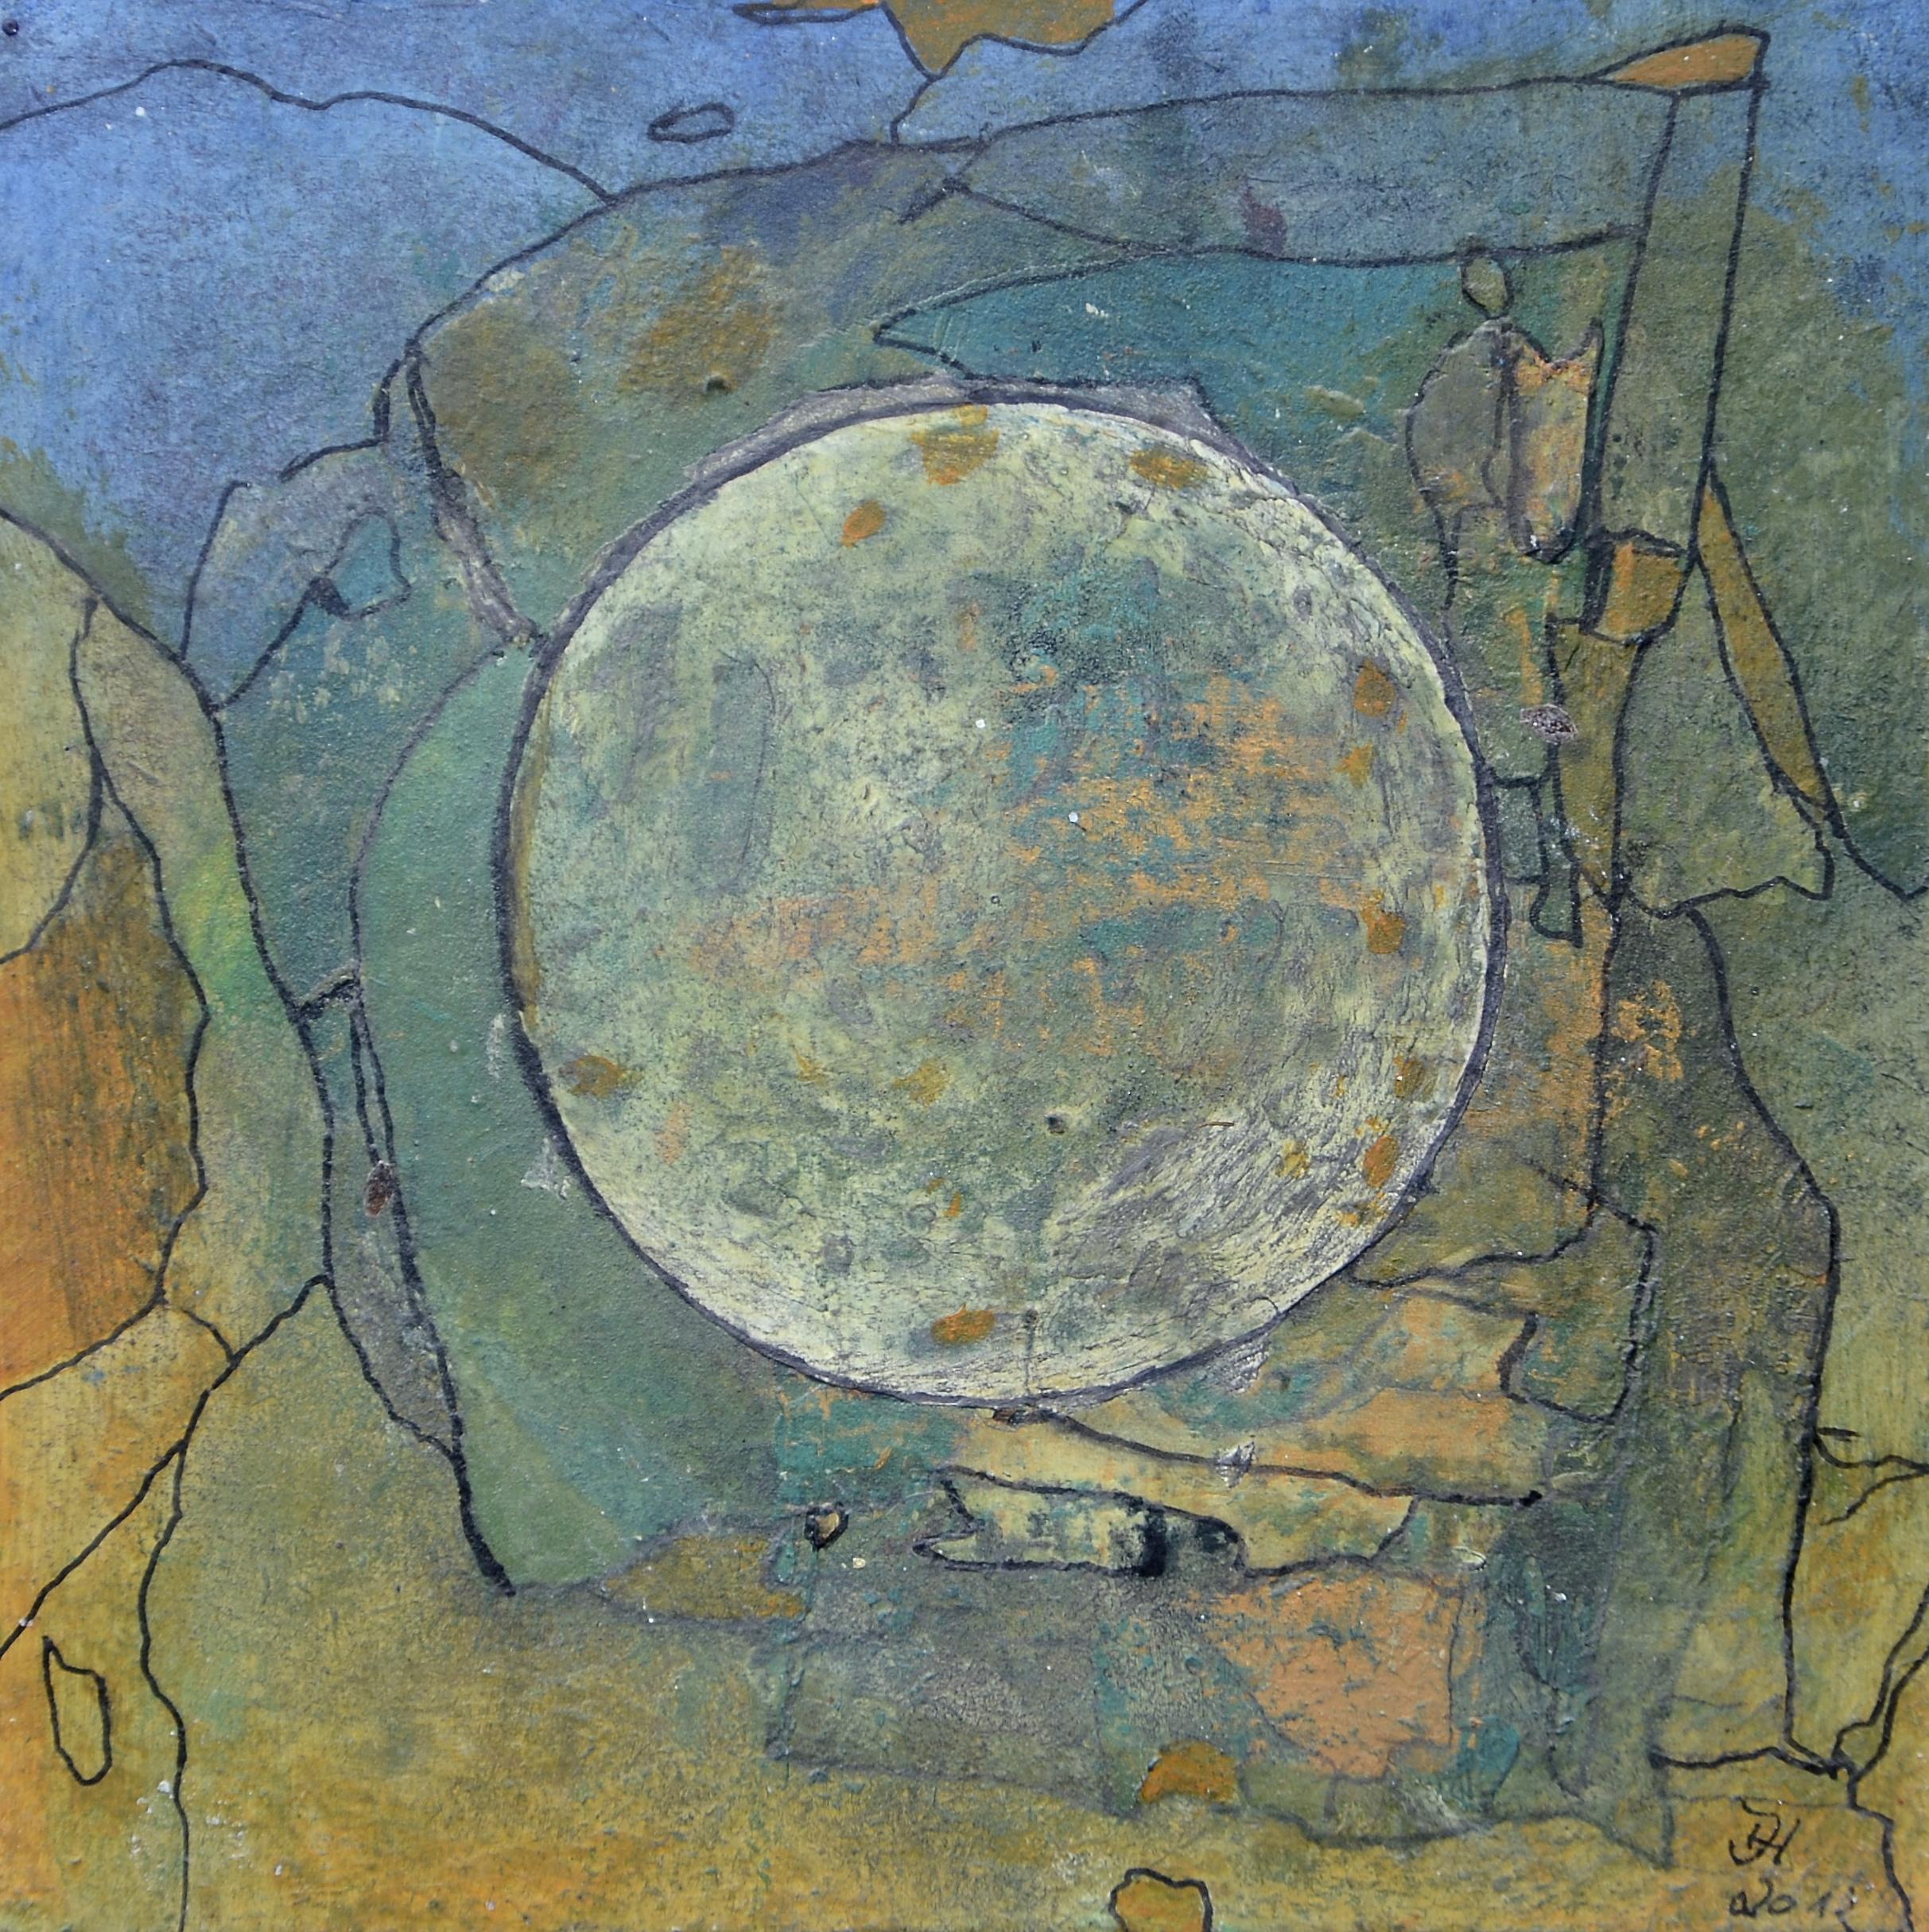 hinterm mond,acryl auf MDF,15x15,2012.JPG